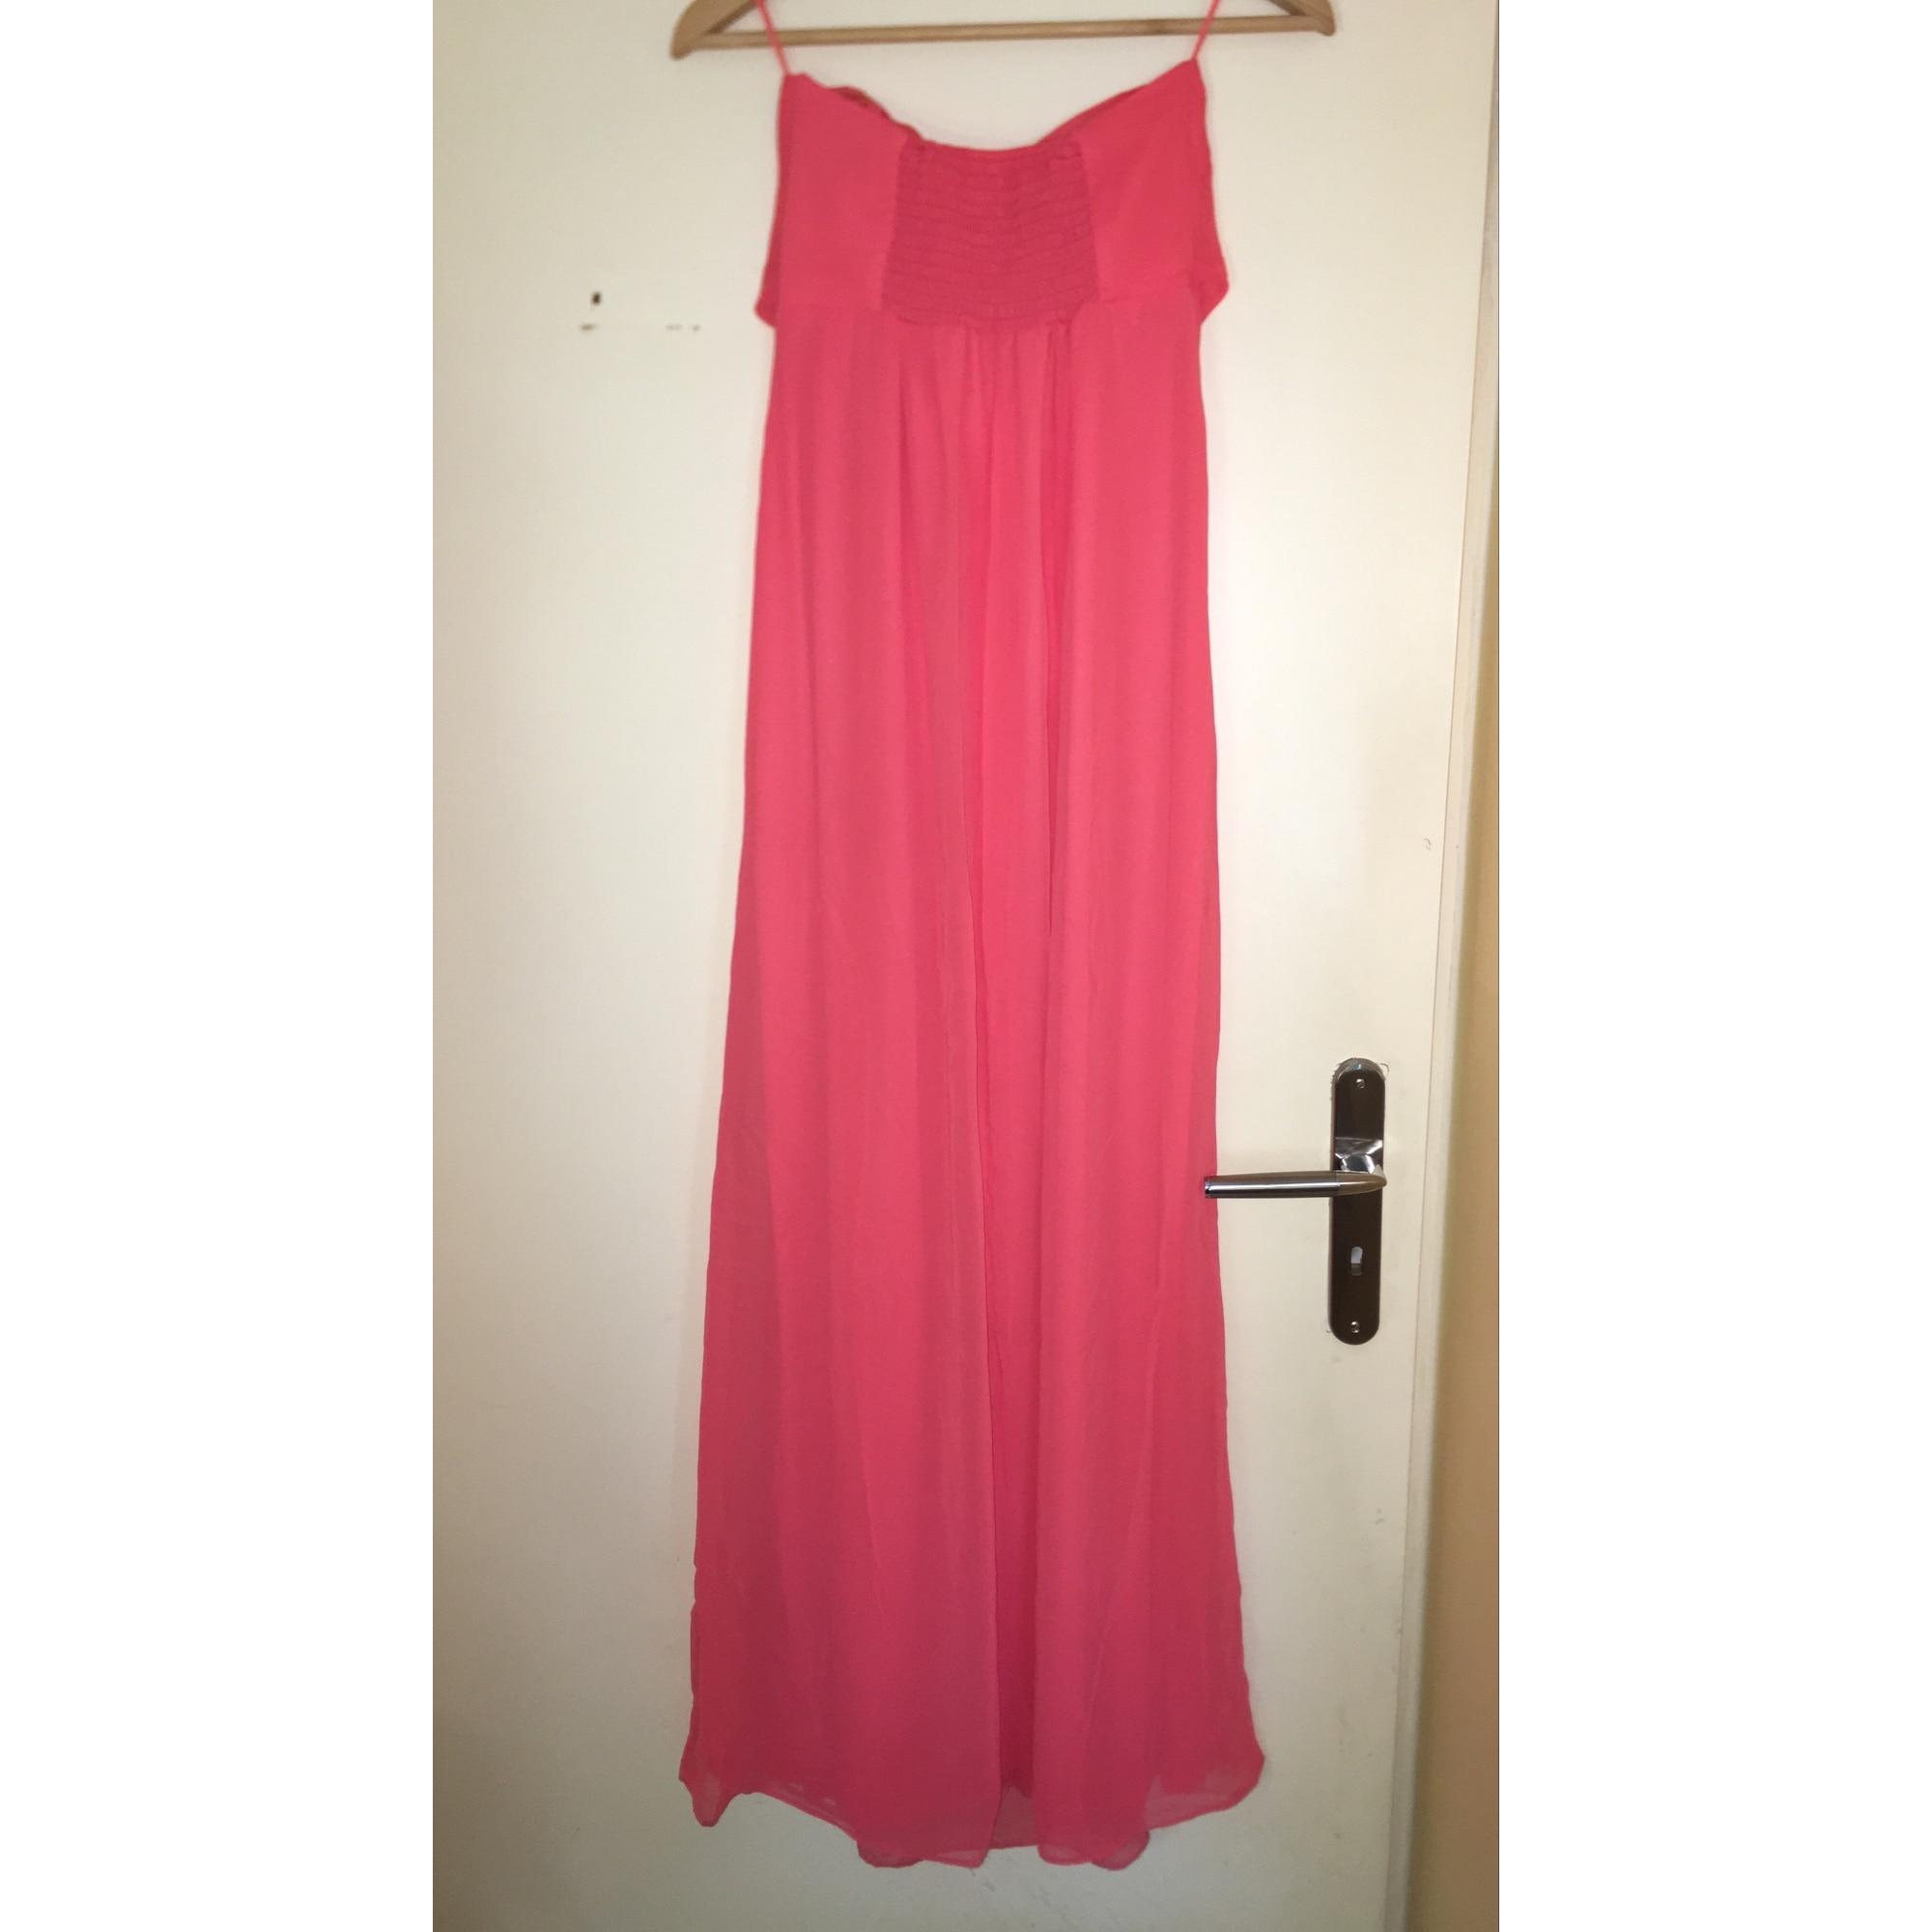 Robe Longue Asos 36 S T1 Rose 7682212